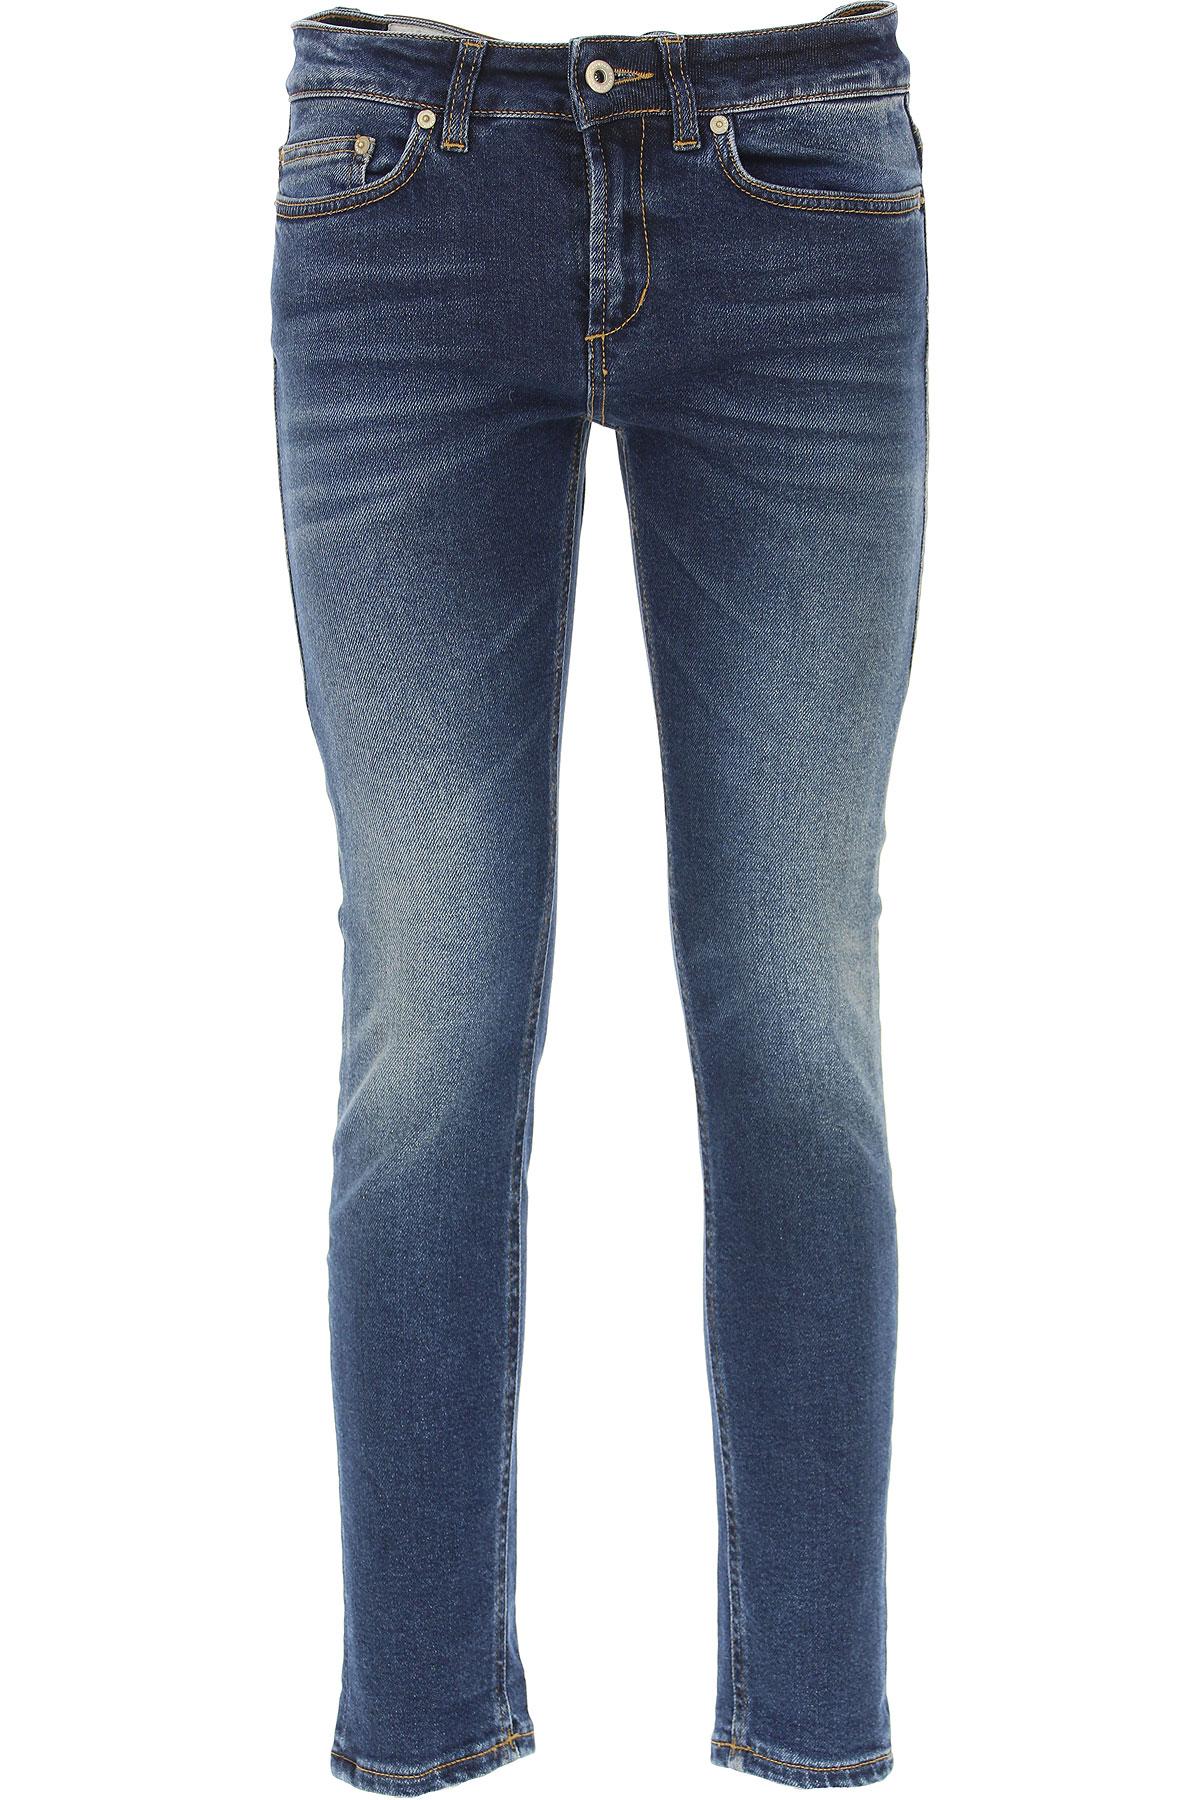 Dondup Jeans On Sale, Denim, Cotton, 2017, 25 26 27 28 30 31